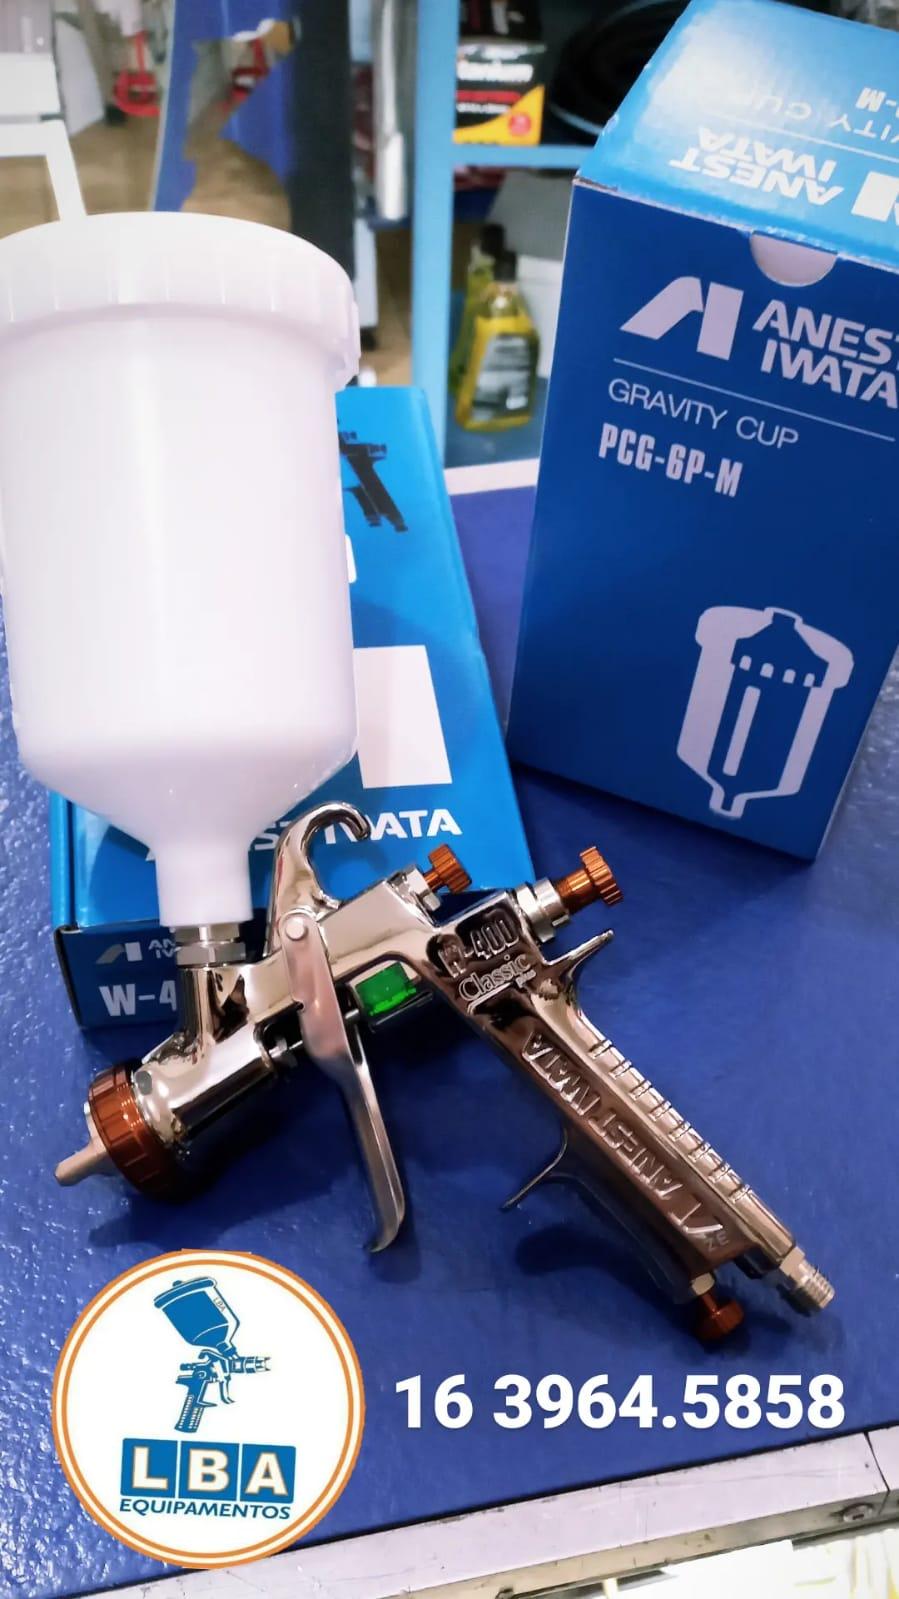 Pistola de pintura W-400 BELLARIA - Anest-Iwata